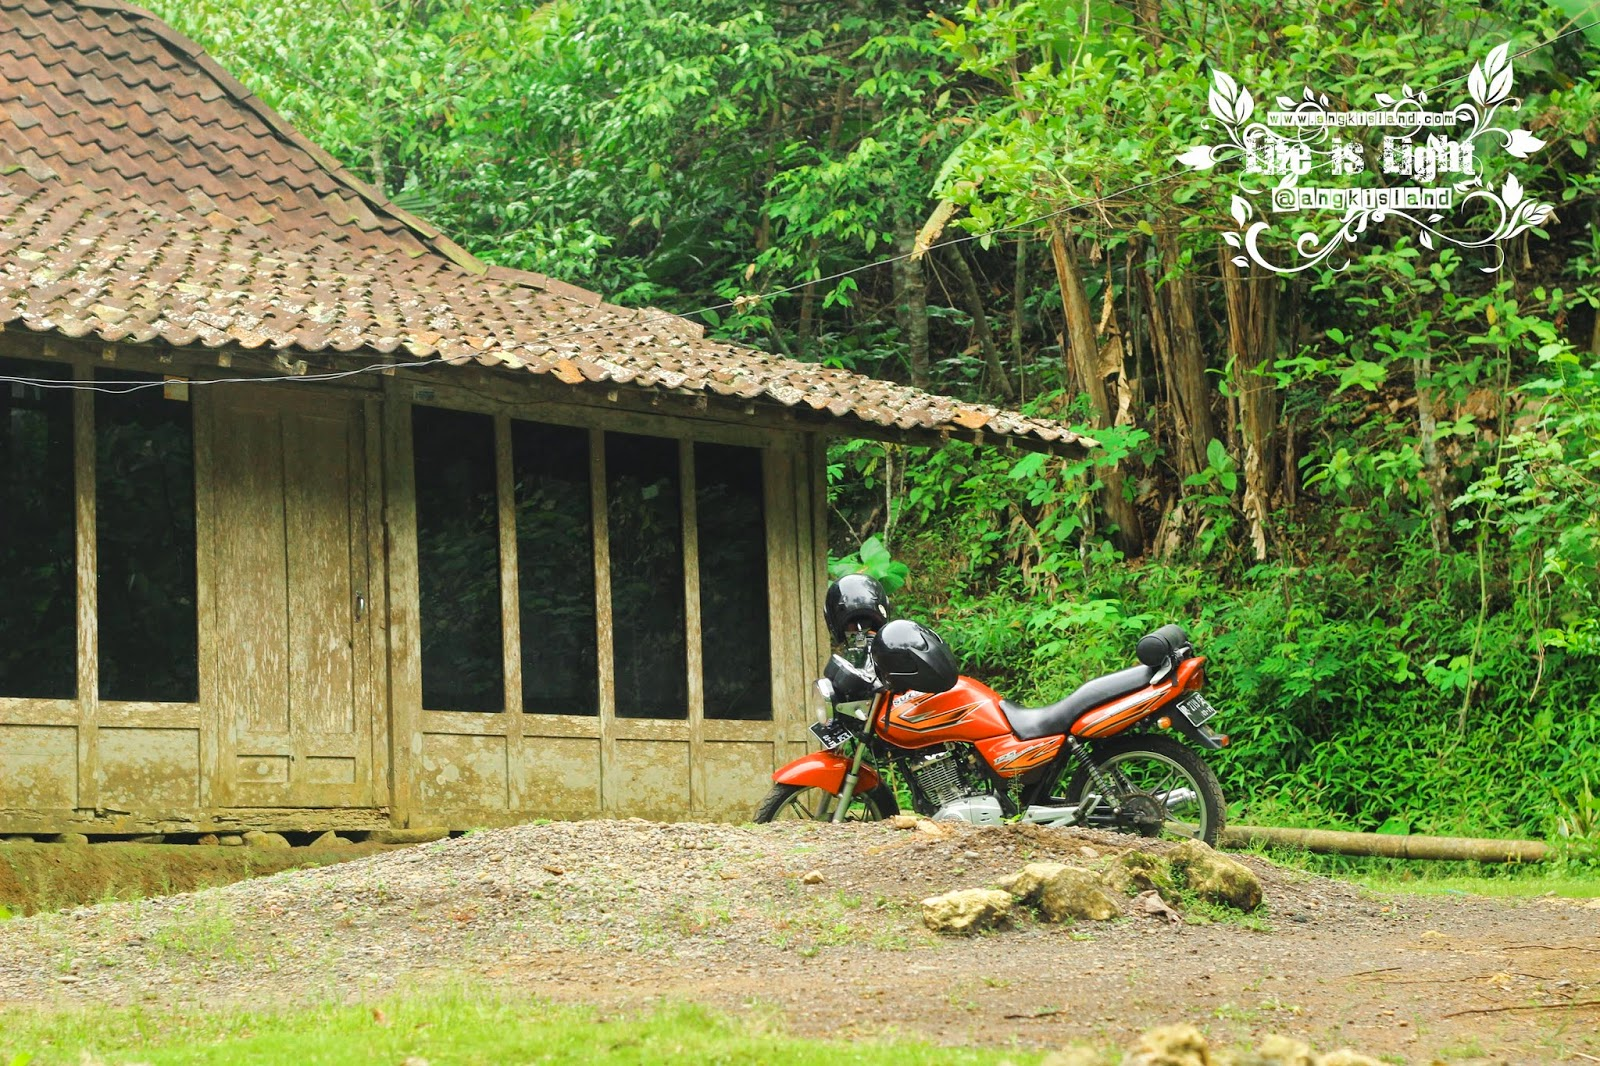 parkir moto grojogan sewu